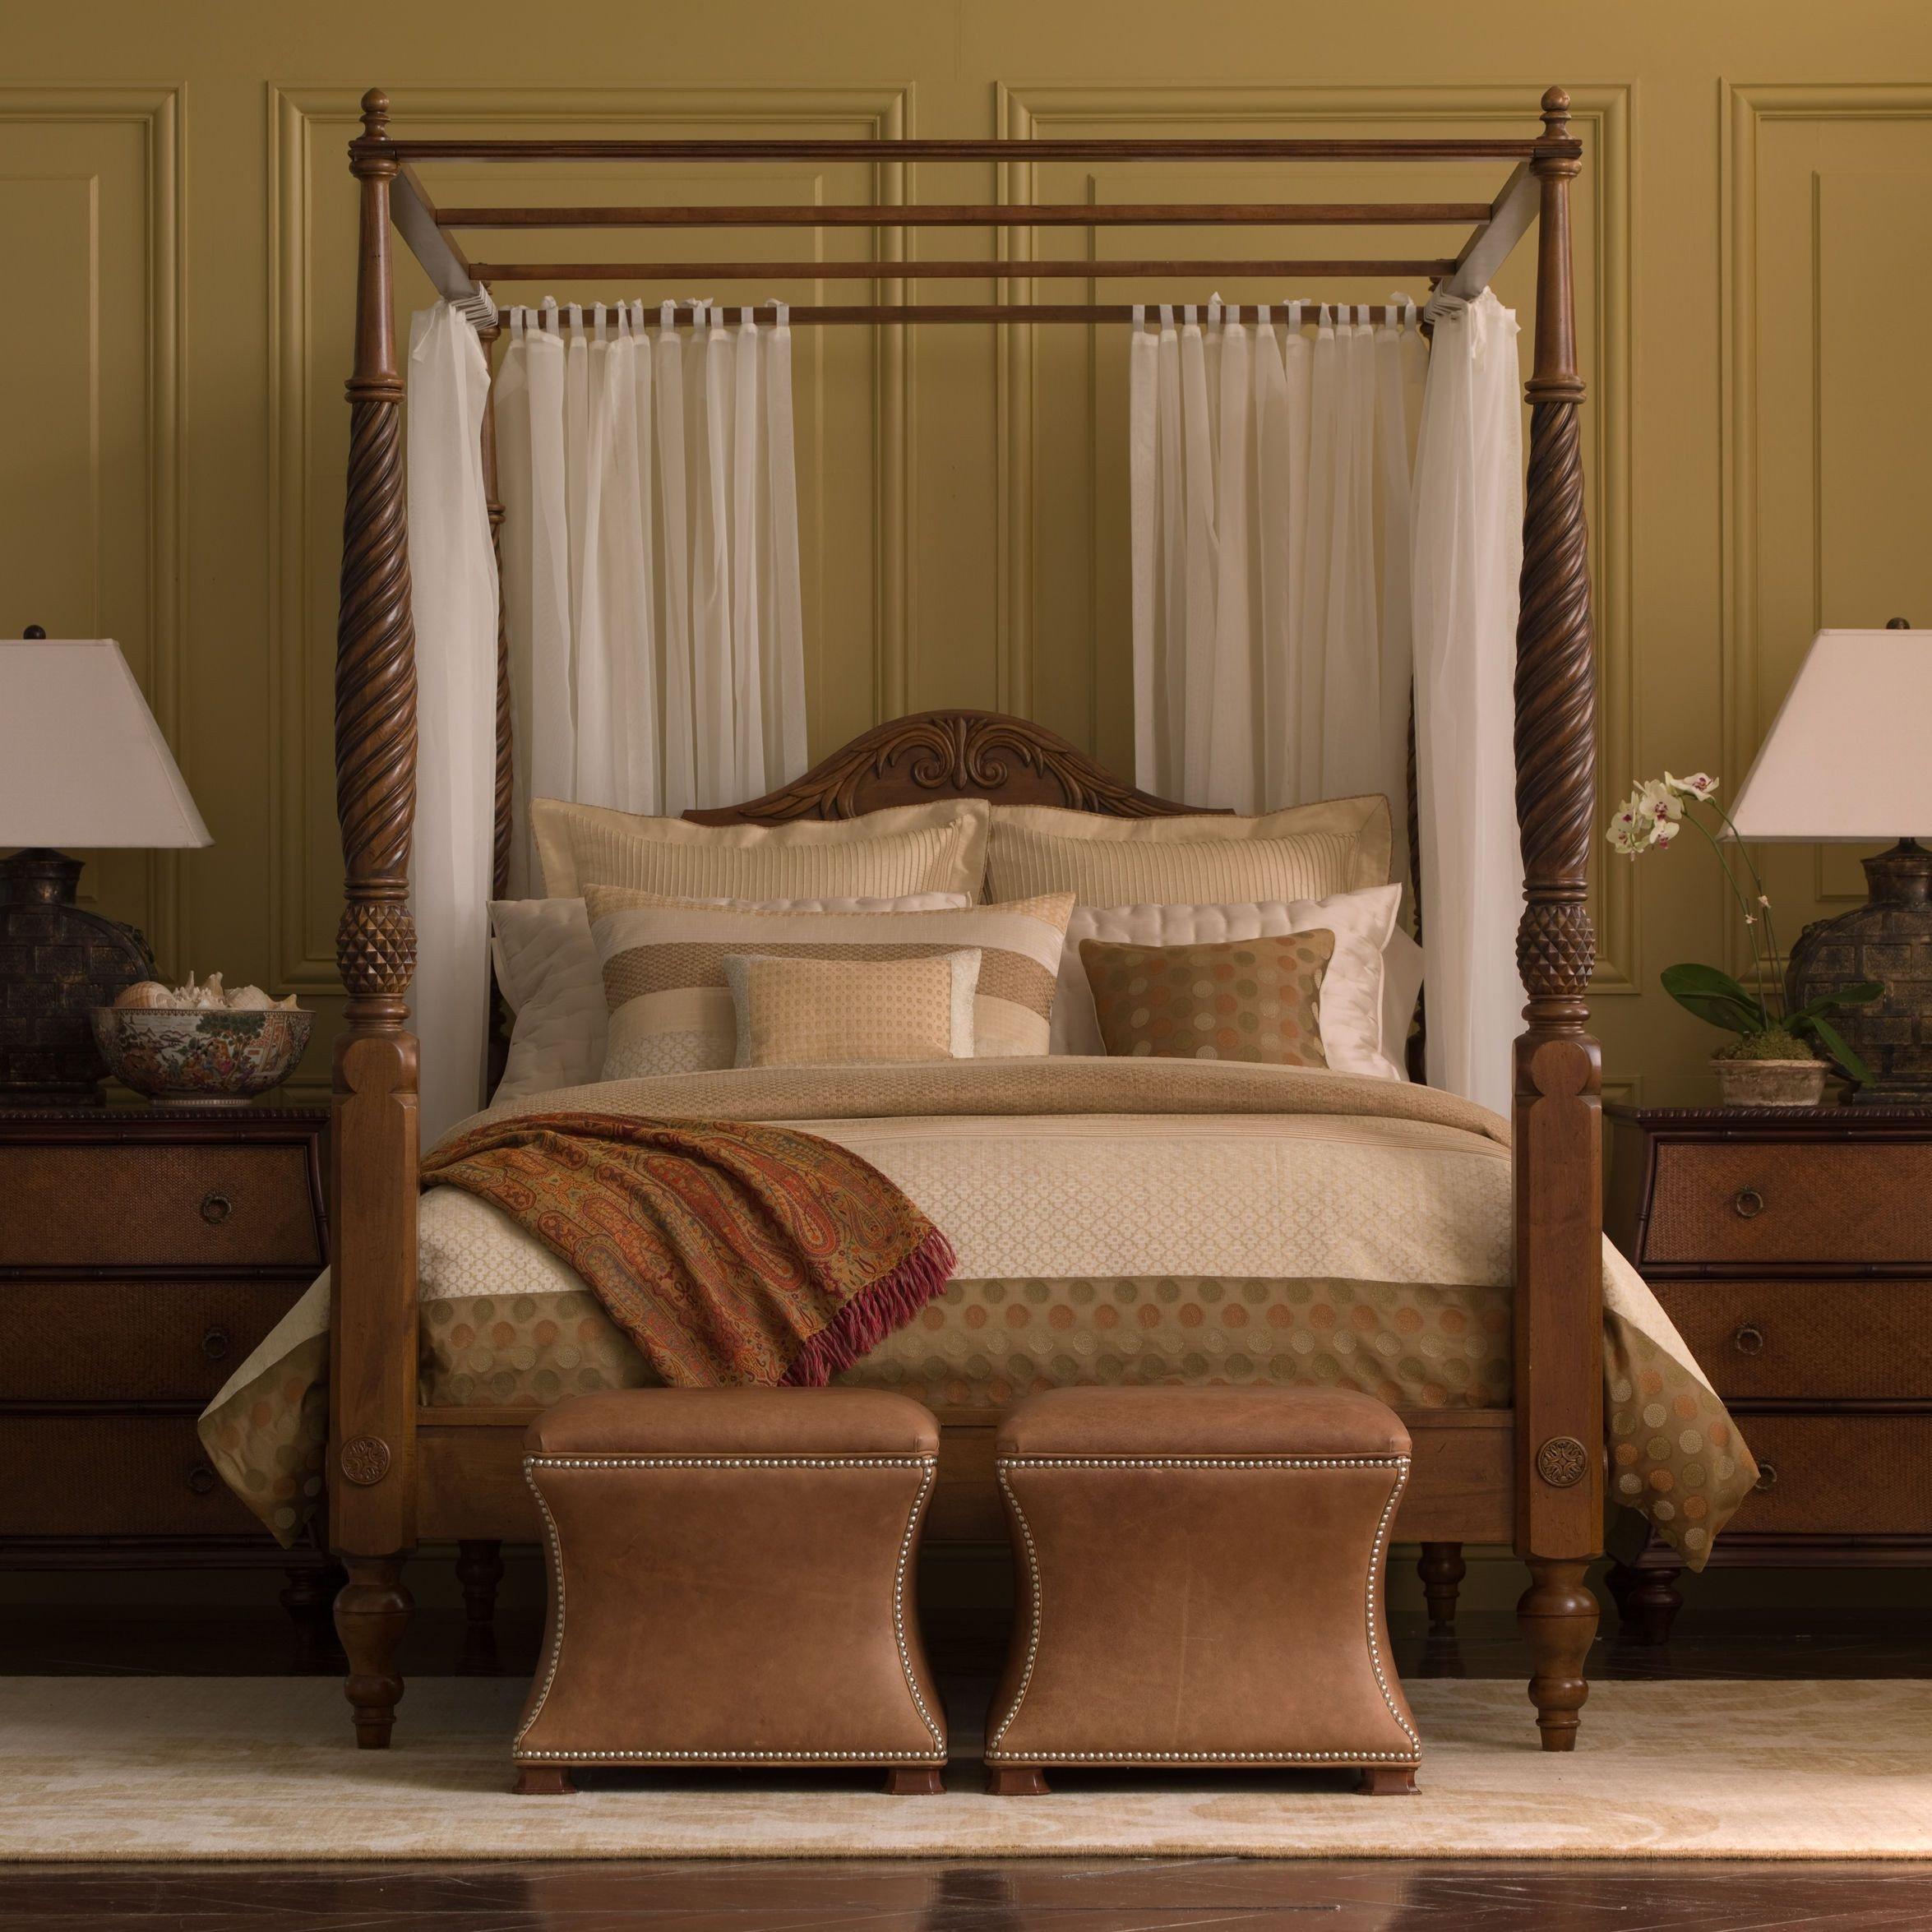 King Size Canopy Bedroom Set Unique Montego Canopy Bed Ethan Allen Us